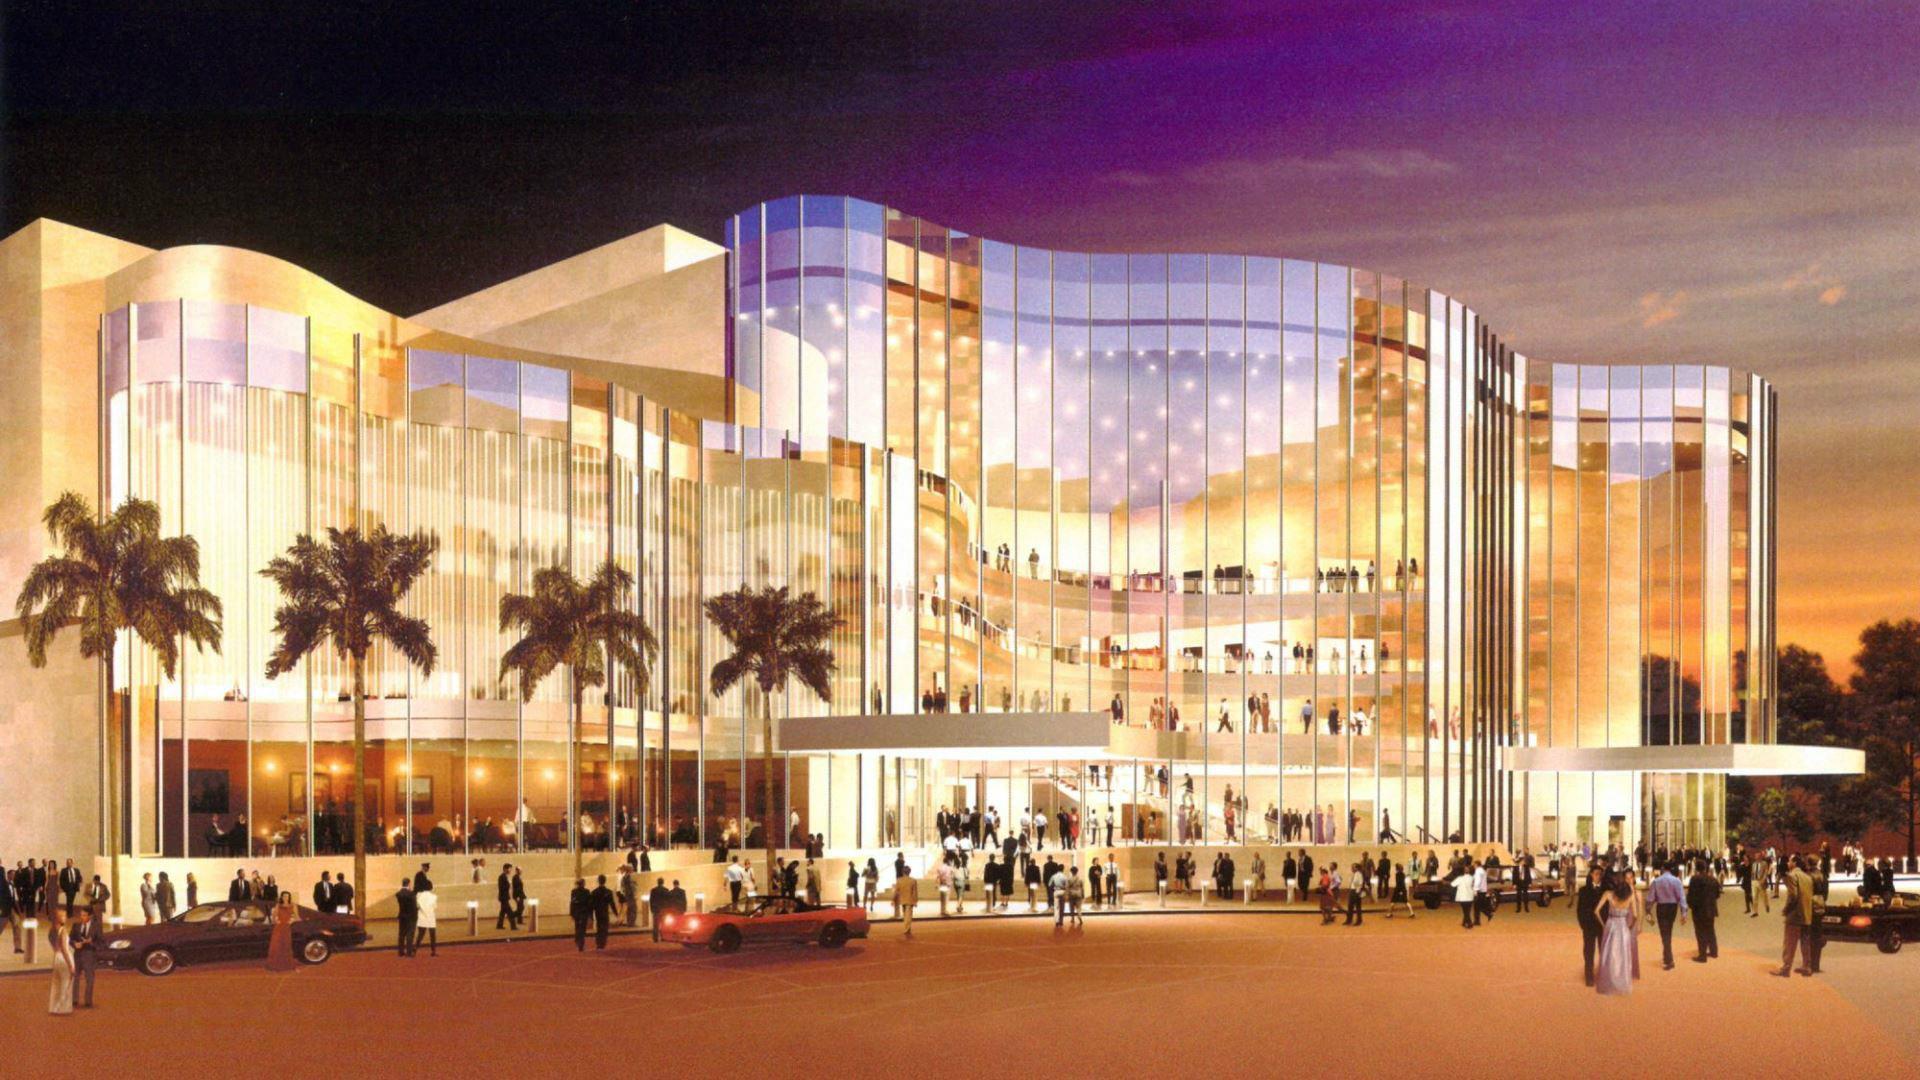 Orange County Performing Arts Center - Fluor Pm Regarding Oc Performing Arts Schedule